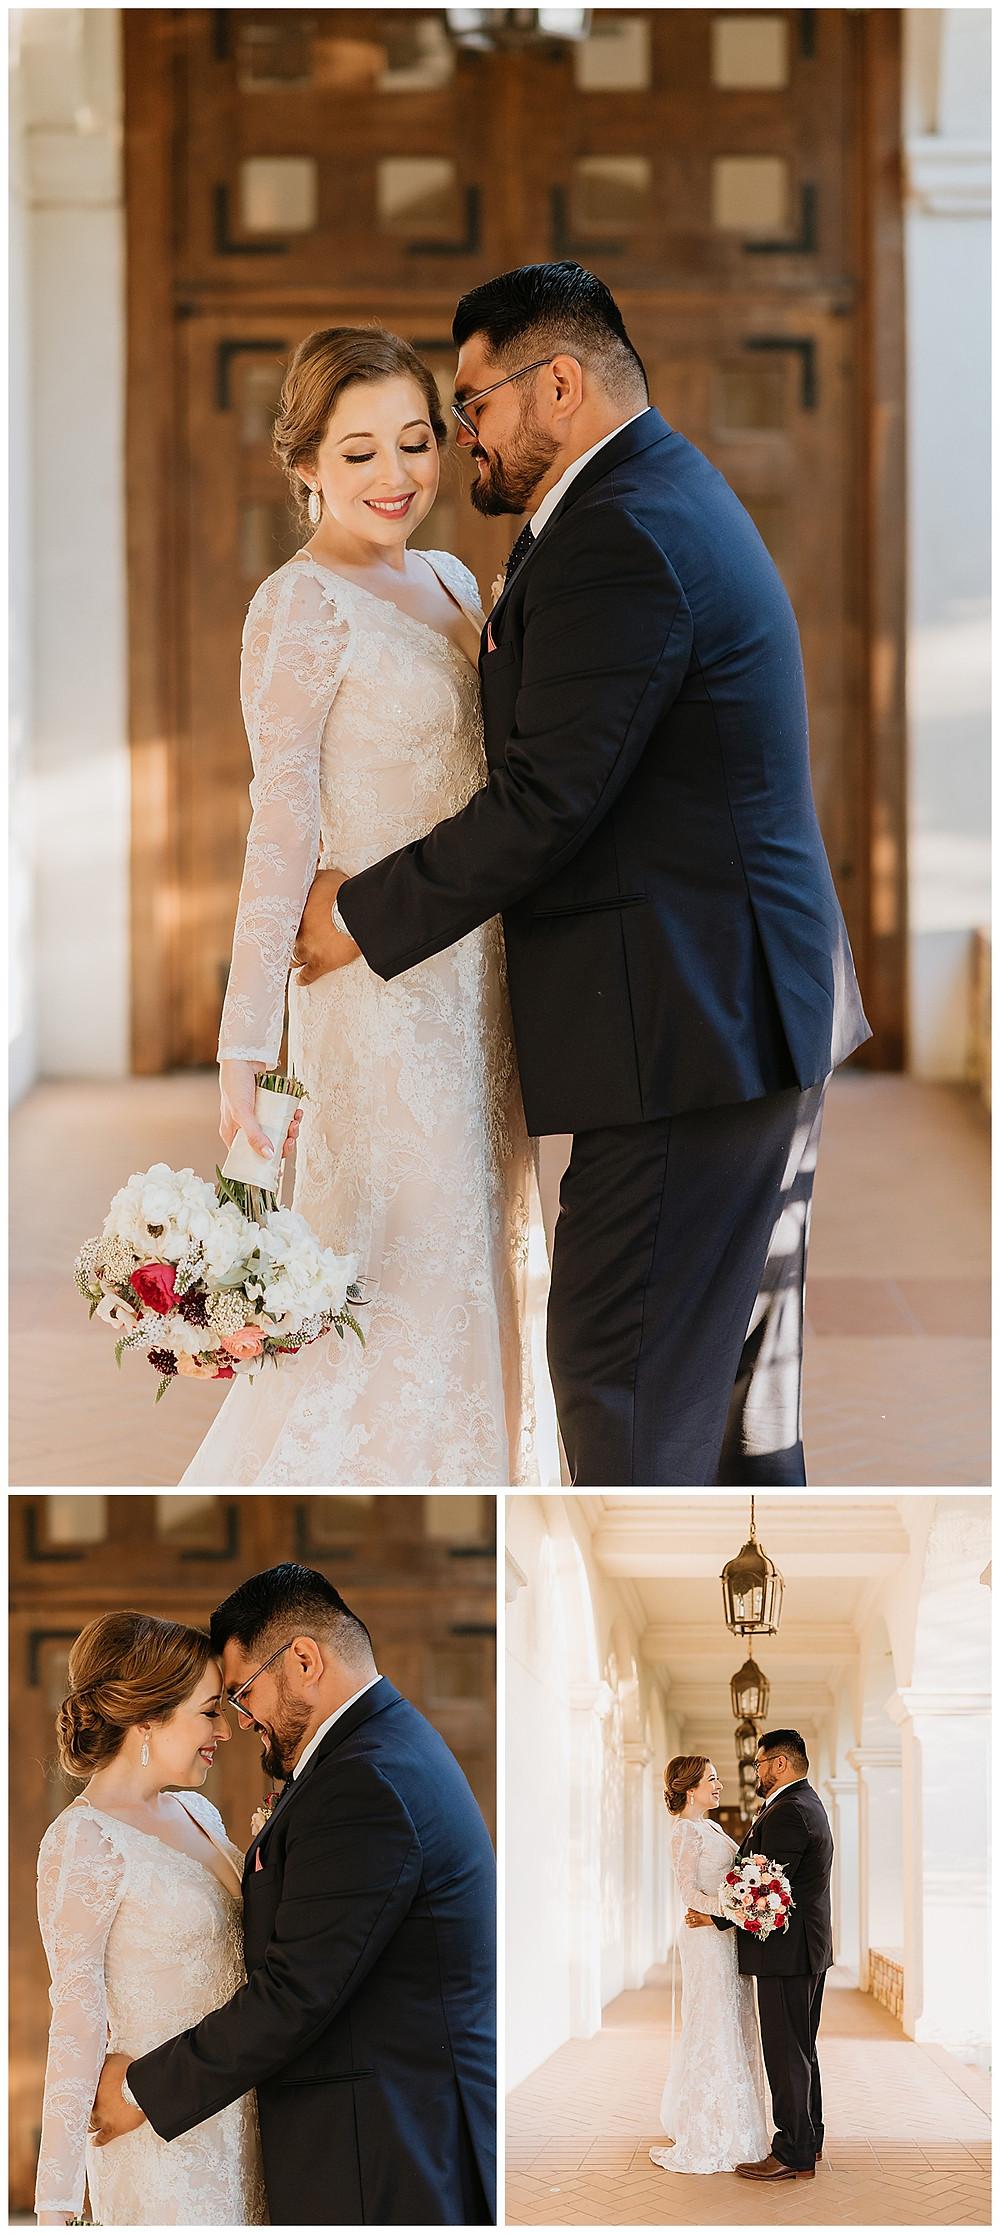 RGV Bride and Groom